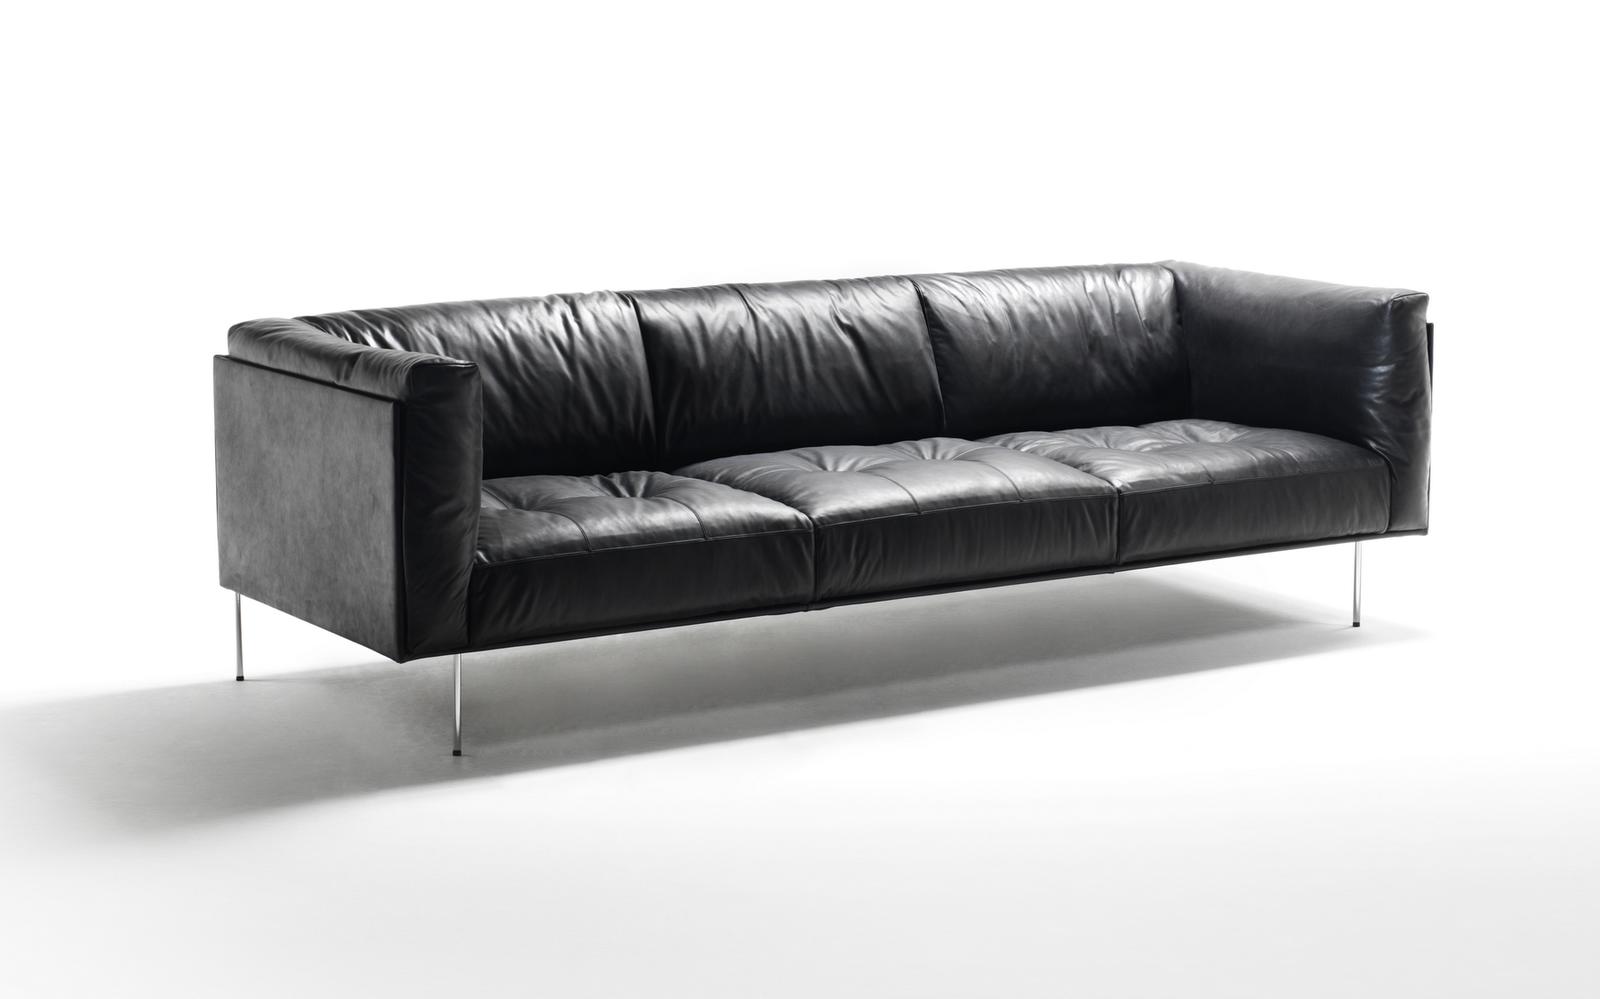 Graye Los Angeles Rod Seating Series From Living Divani In 2020 Italian Sofa Designs Leather Sofa Sofa